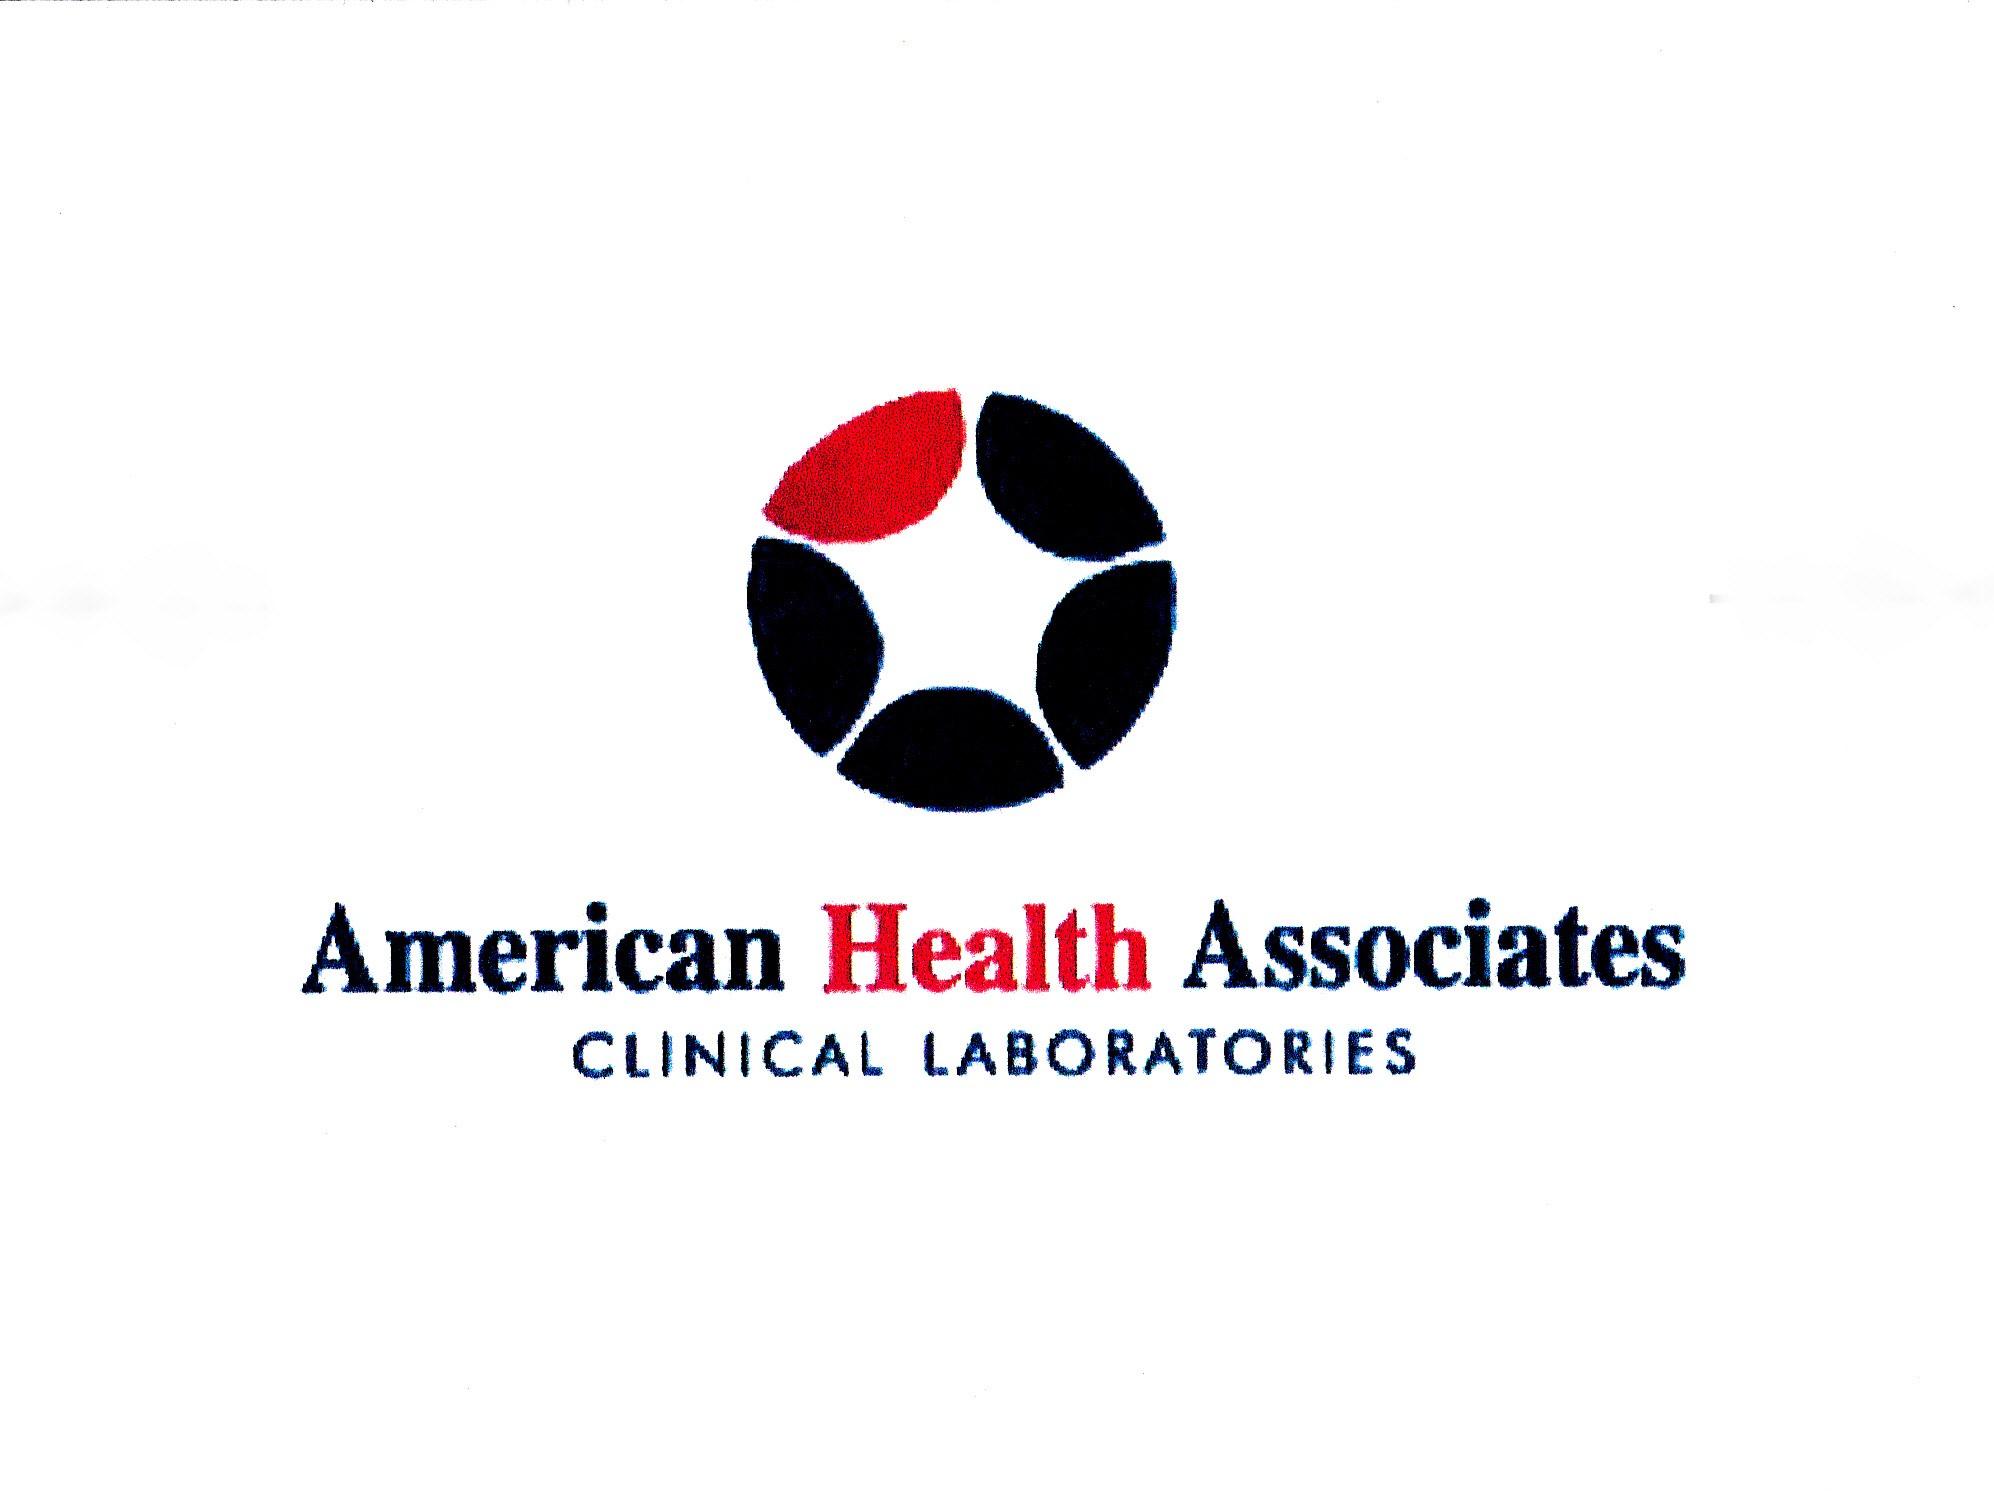 American Health Associates